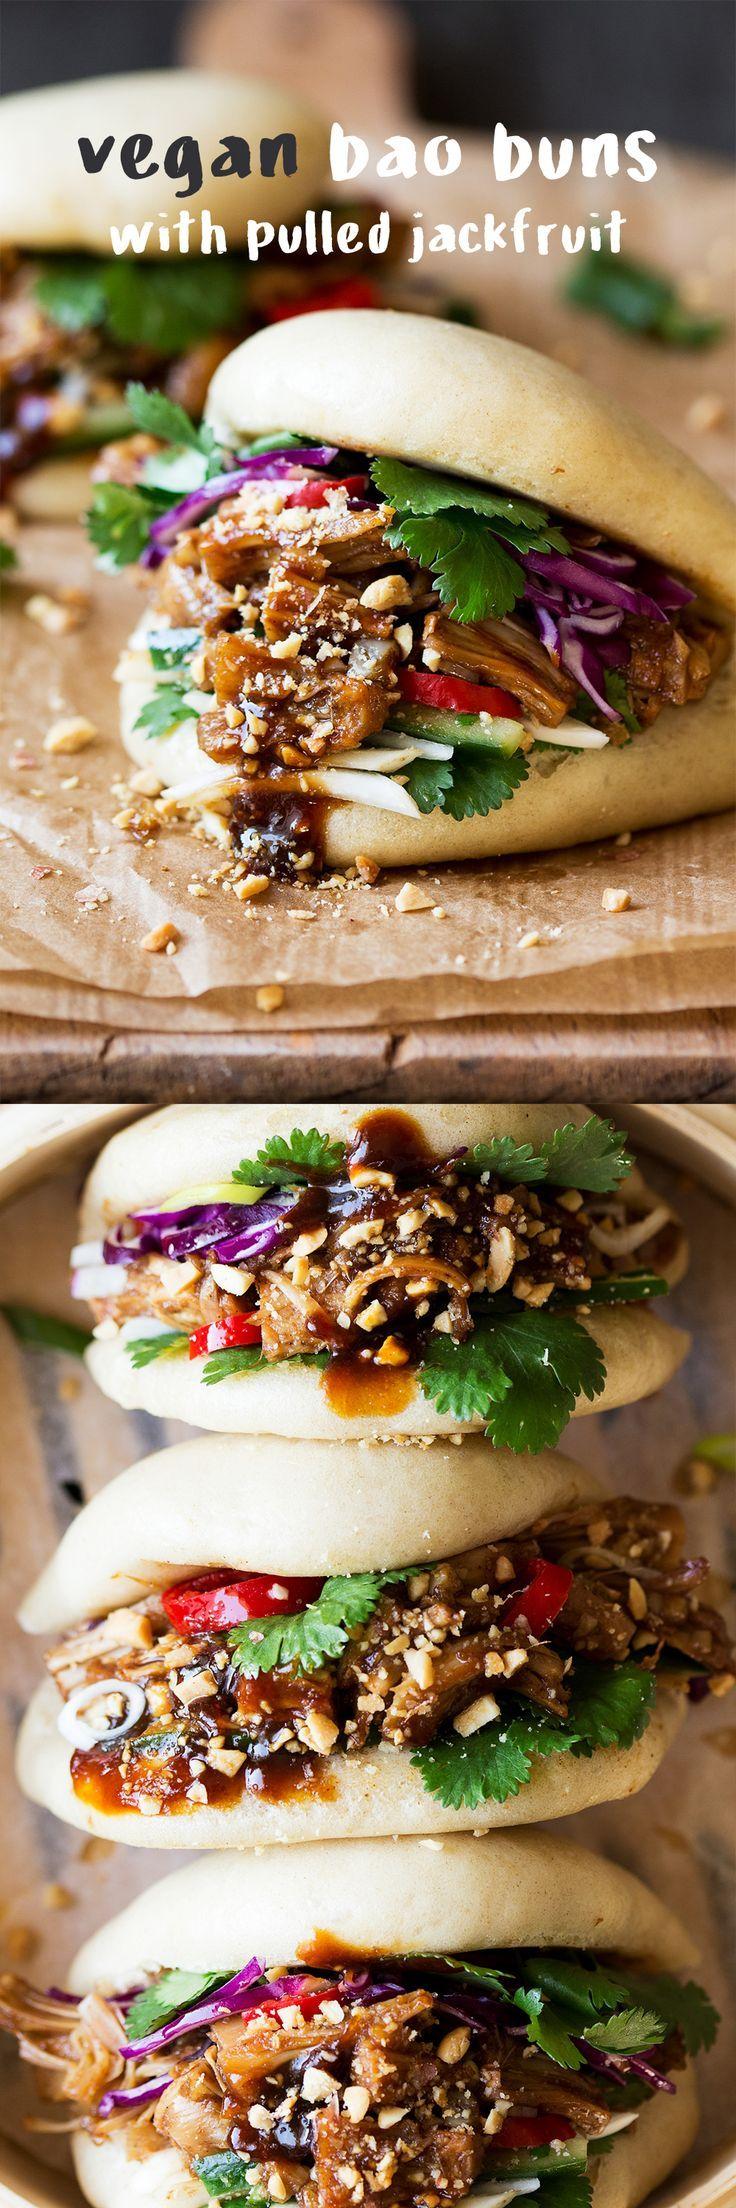 #vegan #bao #baozi #chinesebuns #baobuns #jackfruit #pulledjackfruit #hoisin #dinner #lunch #chinese #chinesefood #veganbao